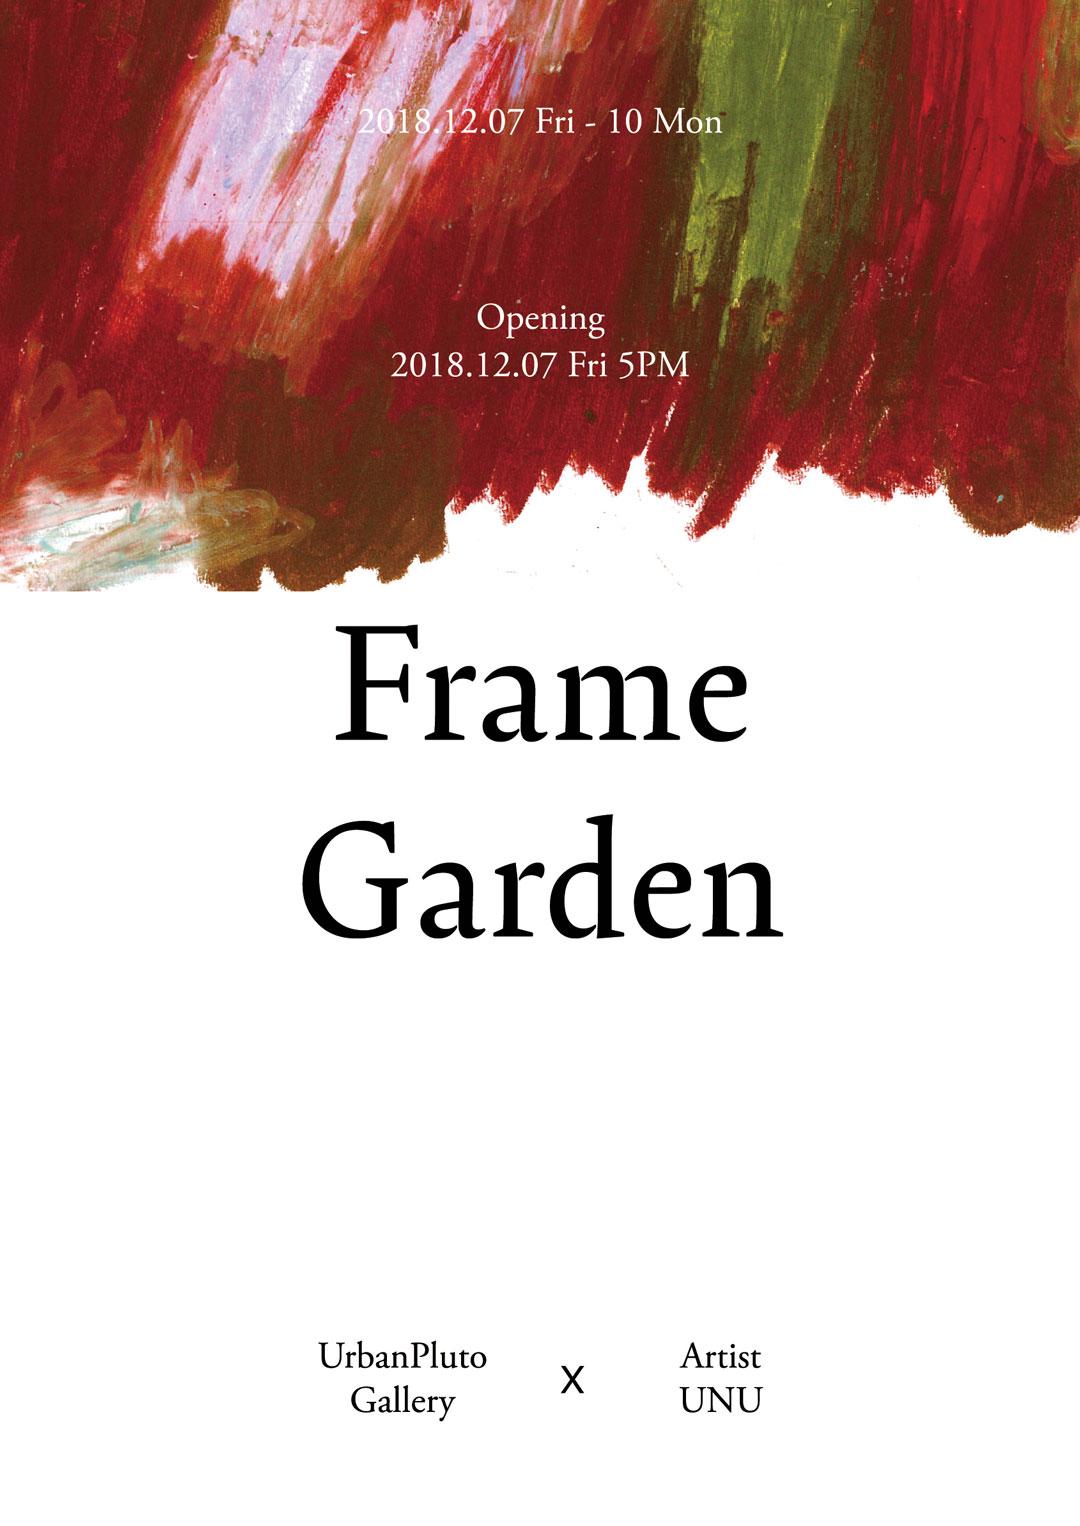 Frame garden : 스마트폰 속의 아날로그 정원 - 무료전시